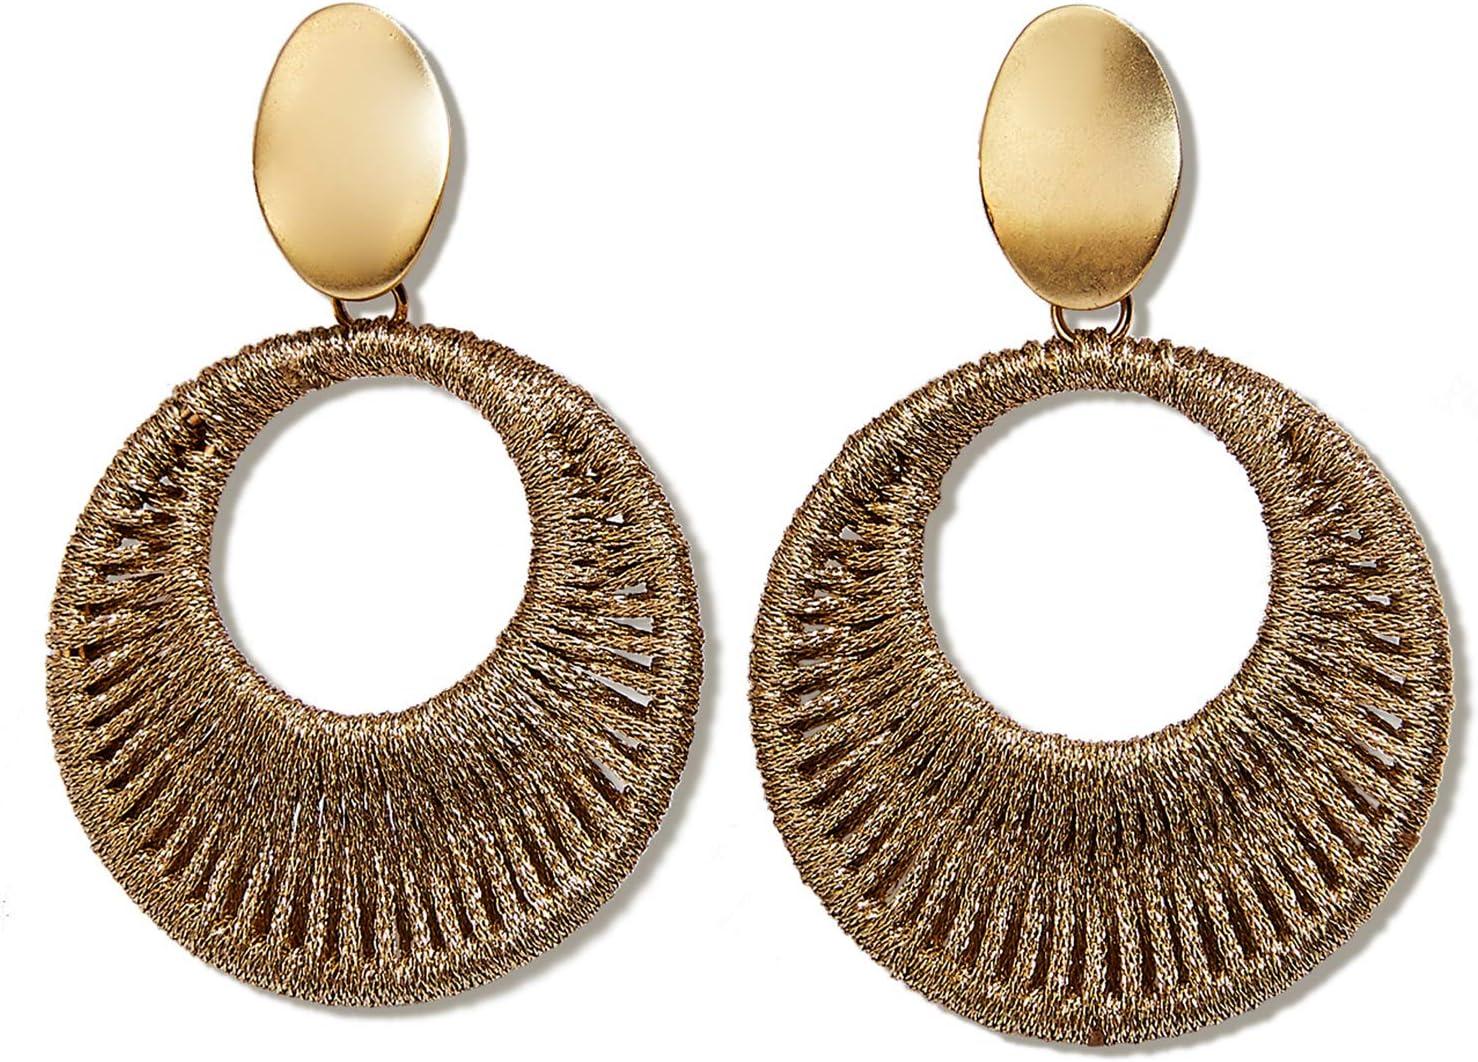 Threader Earrings Handmade from Wood and Resin